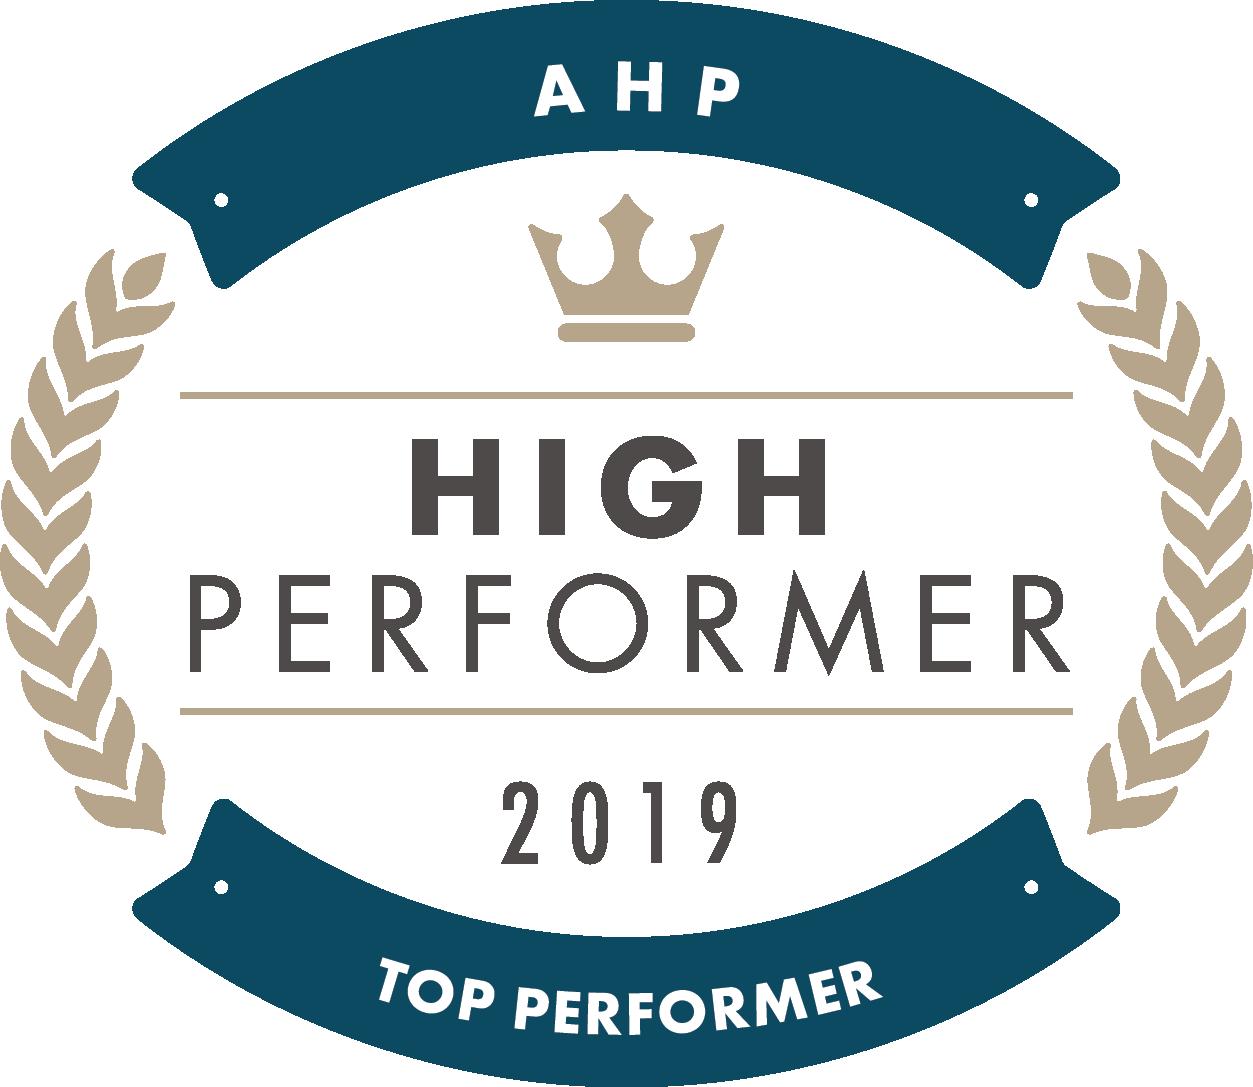 AHP High Performer 2019